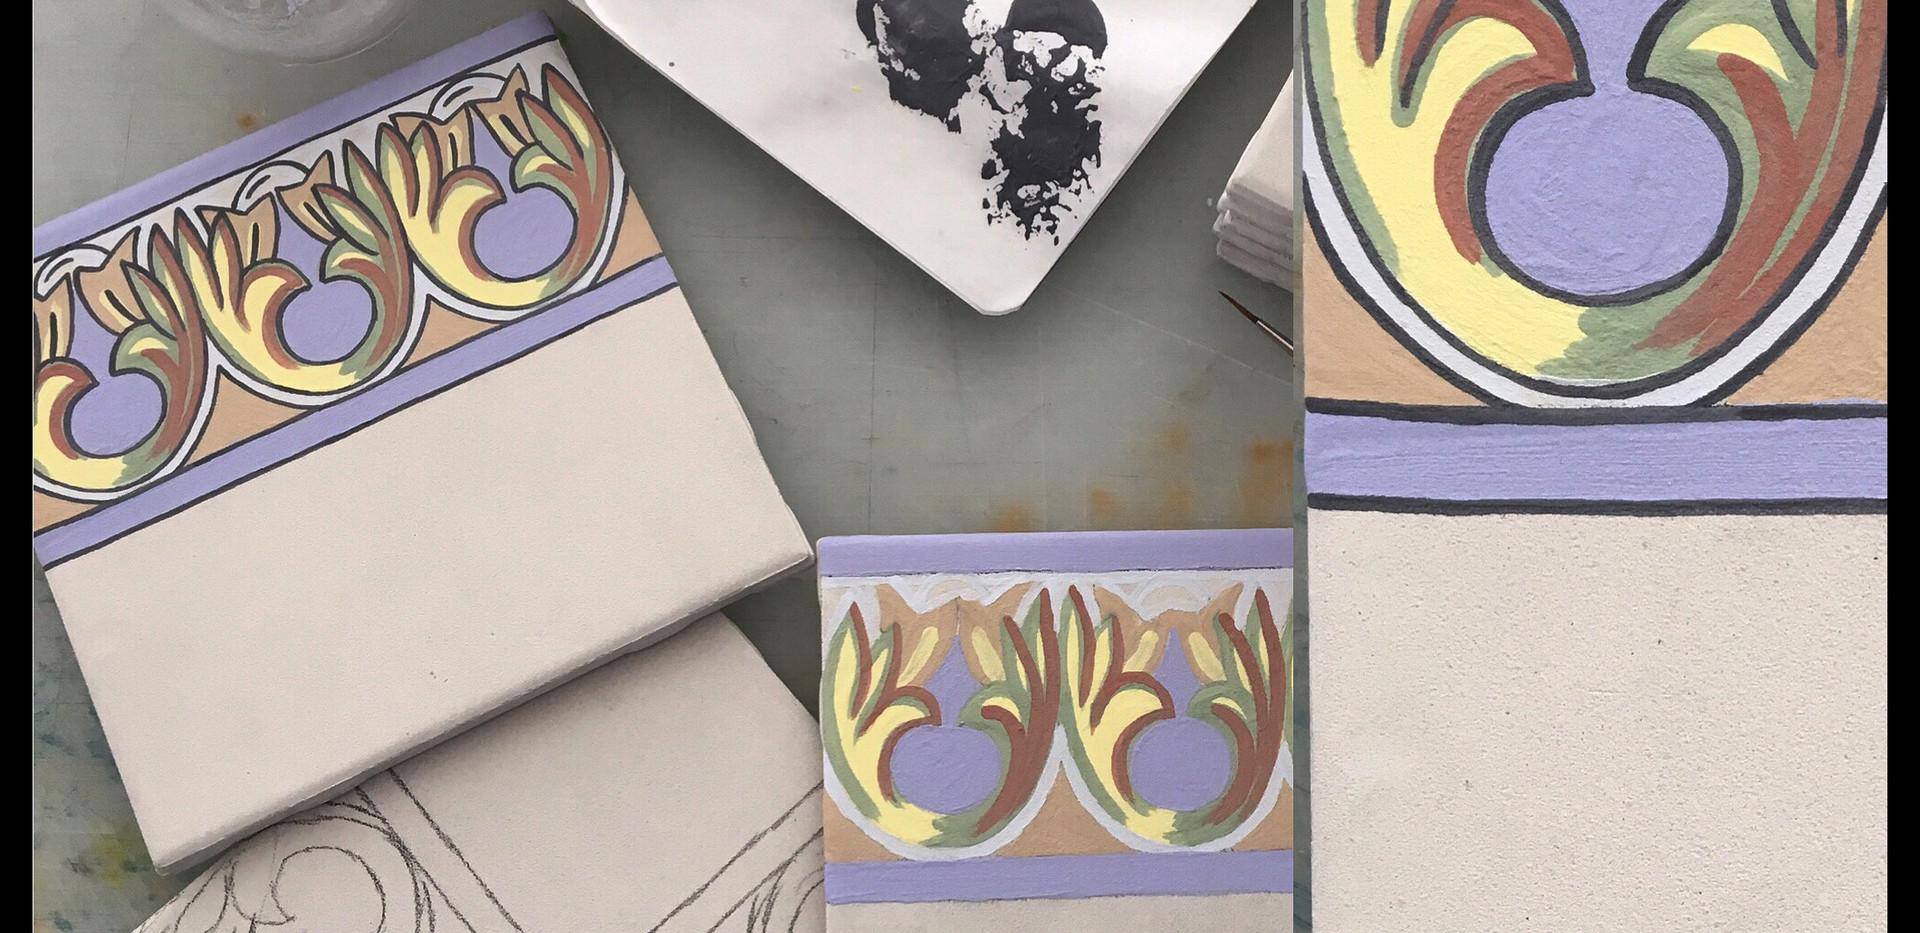 wall-tile-process-glaze-patterns-border-